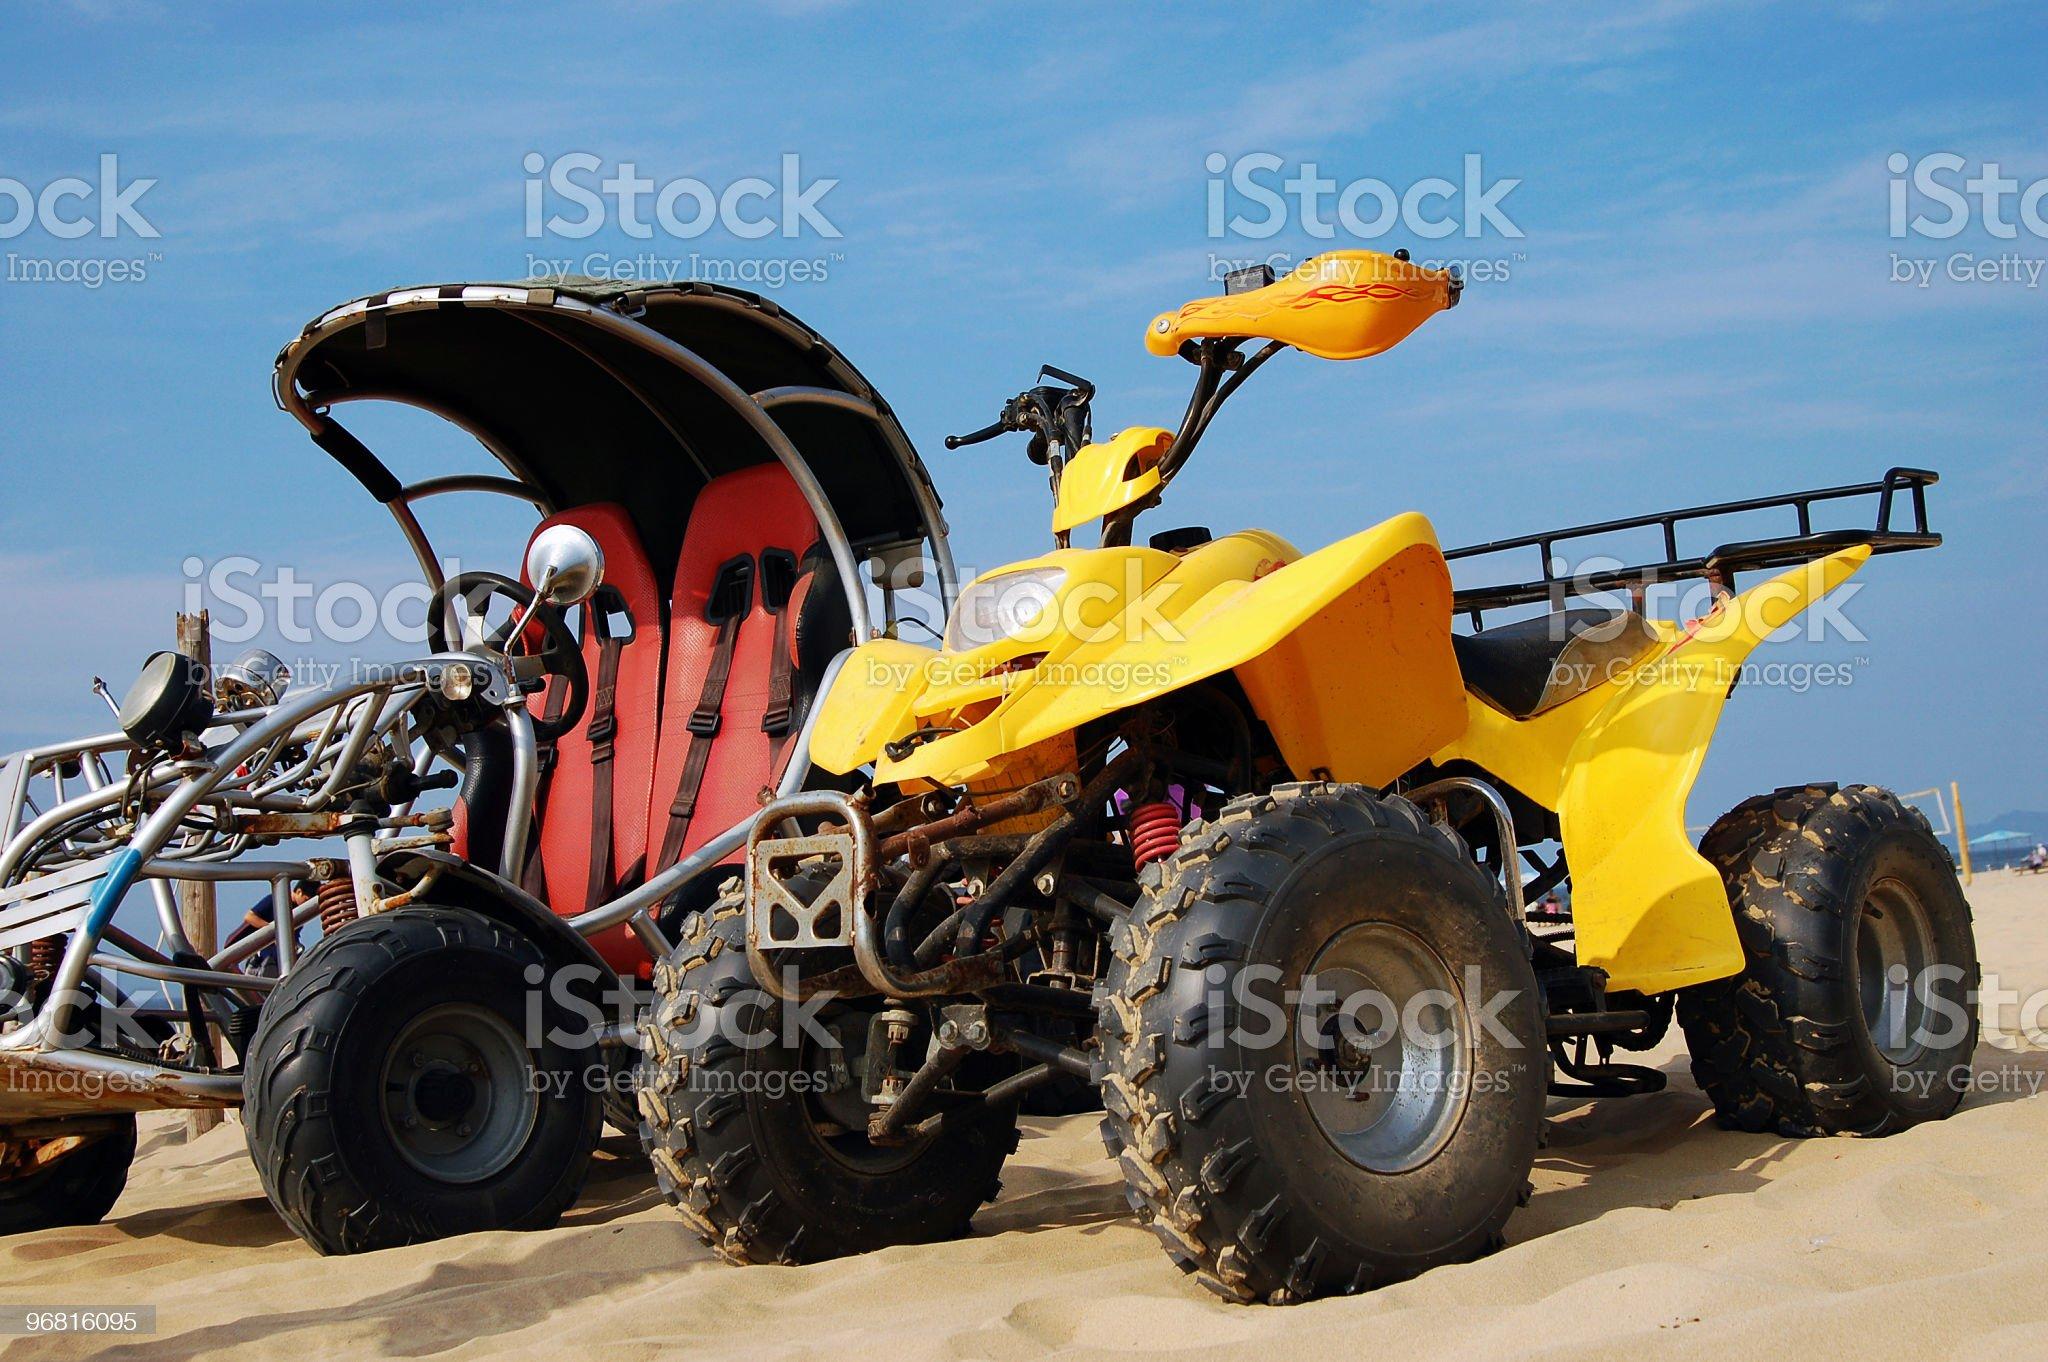 All-Terrain Vehicle royalty-free stock photo